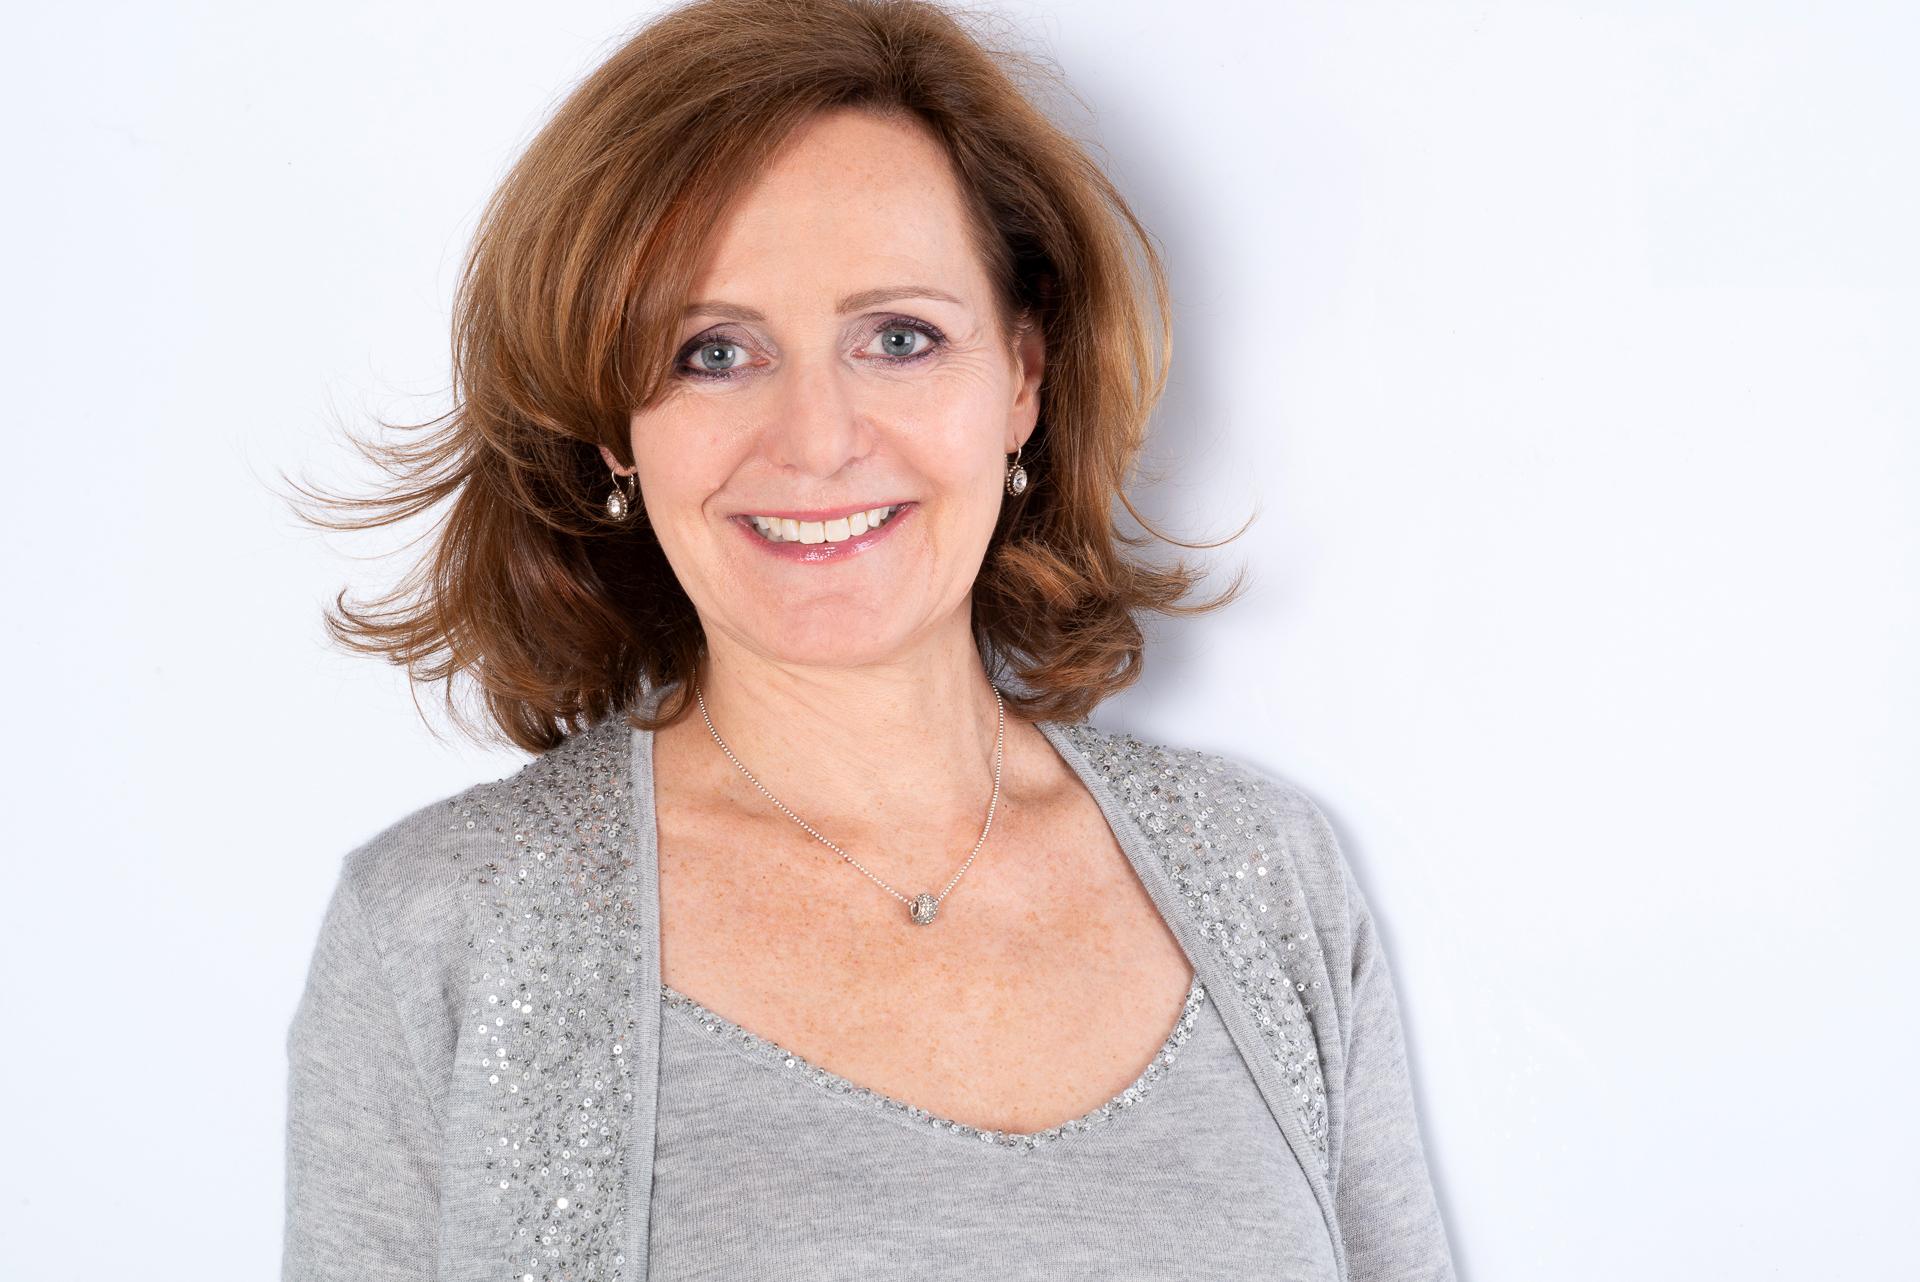 Martina Locher